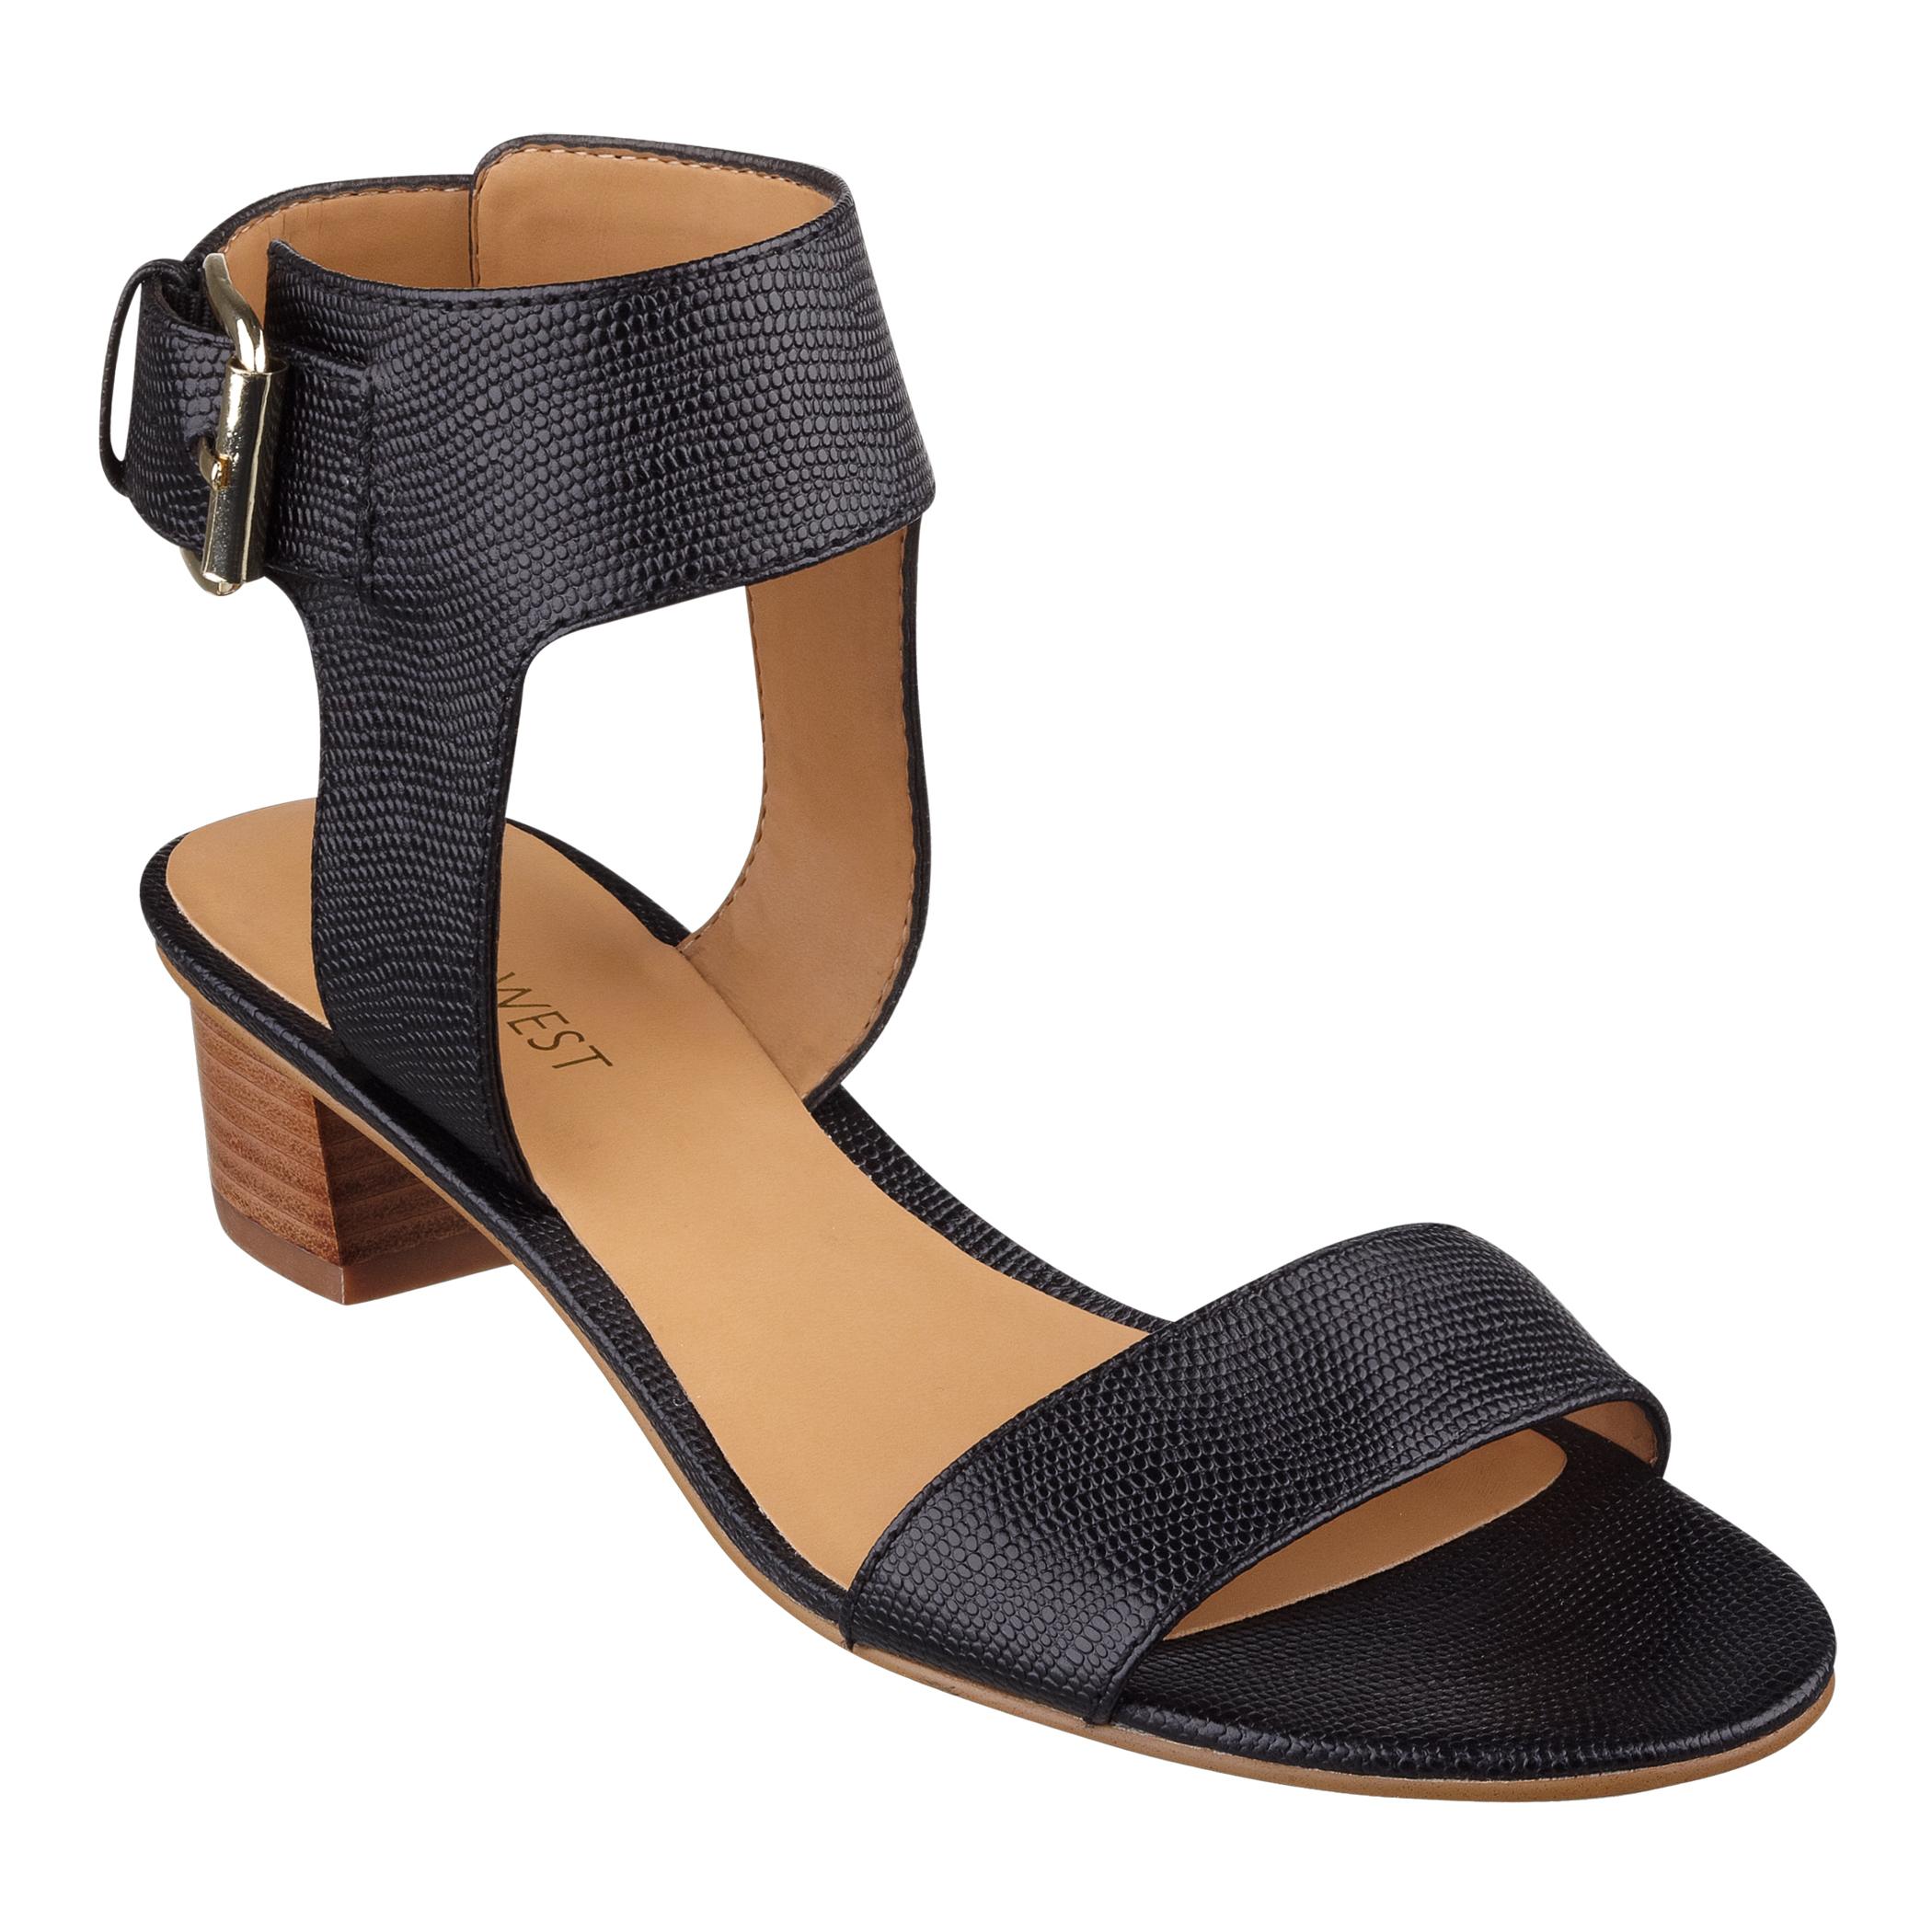 Nine West: Tasha Ankle Strap Sandals